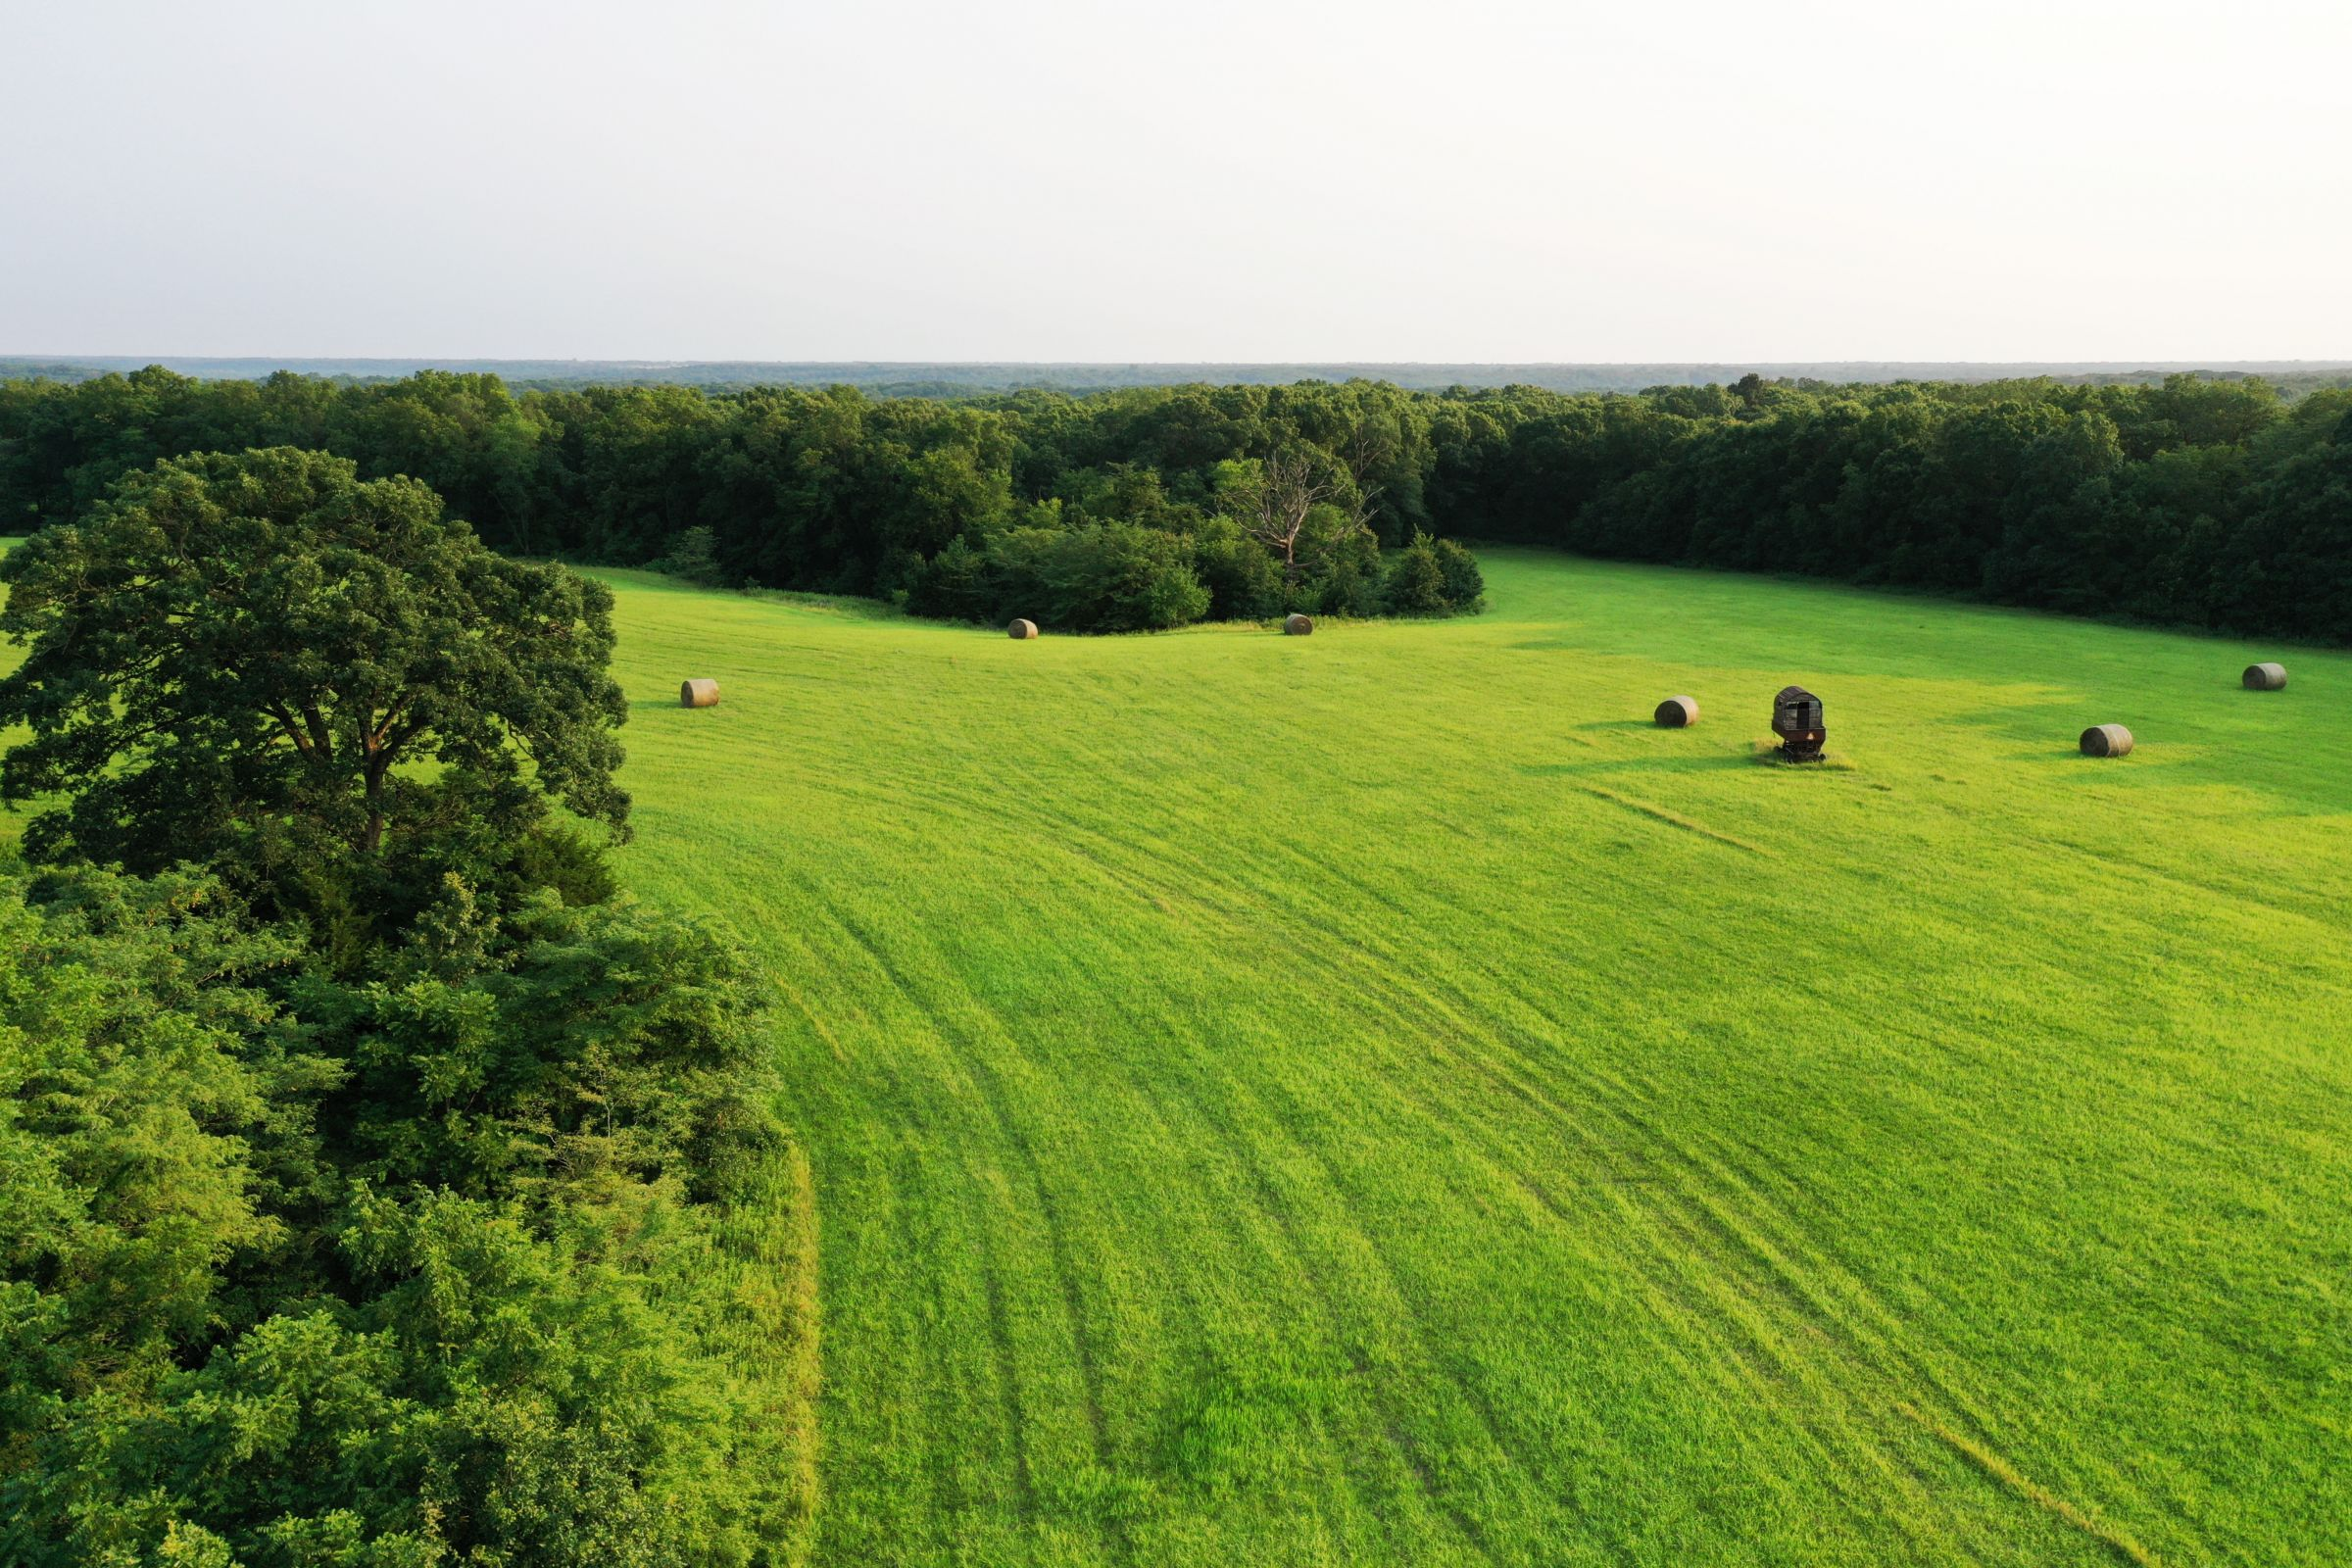 land-lee-county-iowa-340-acres-listing-number-15649-4-2021-07-21-185540.jpg